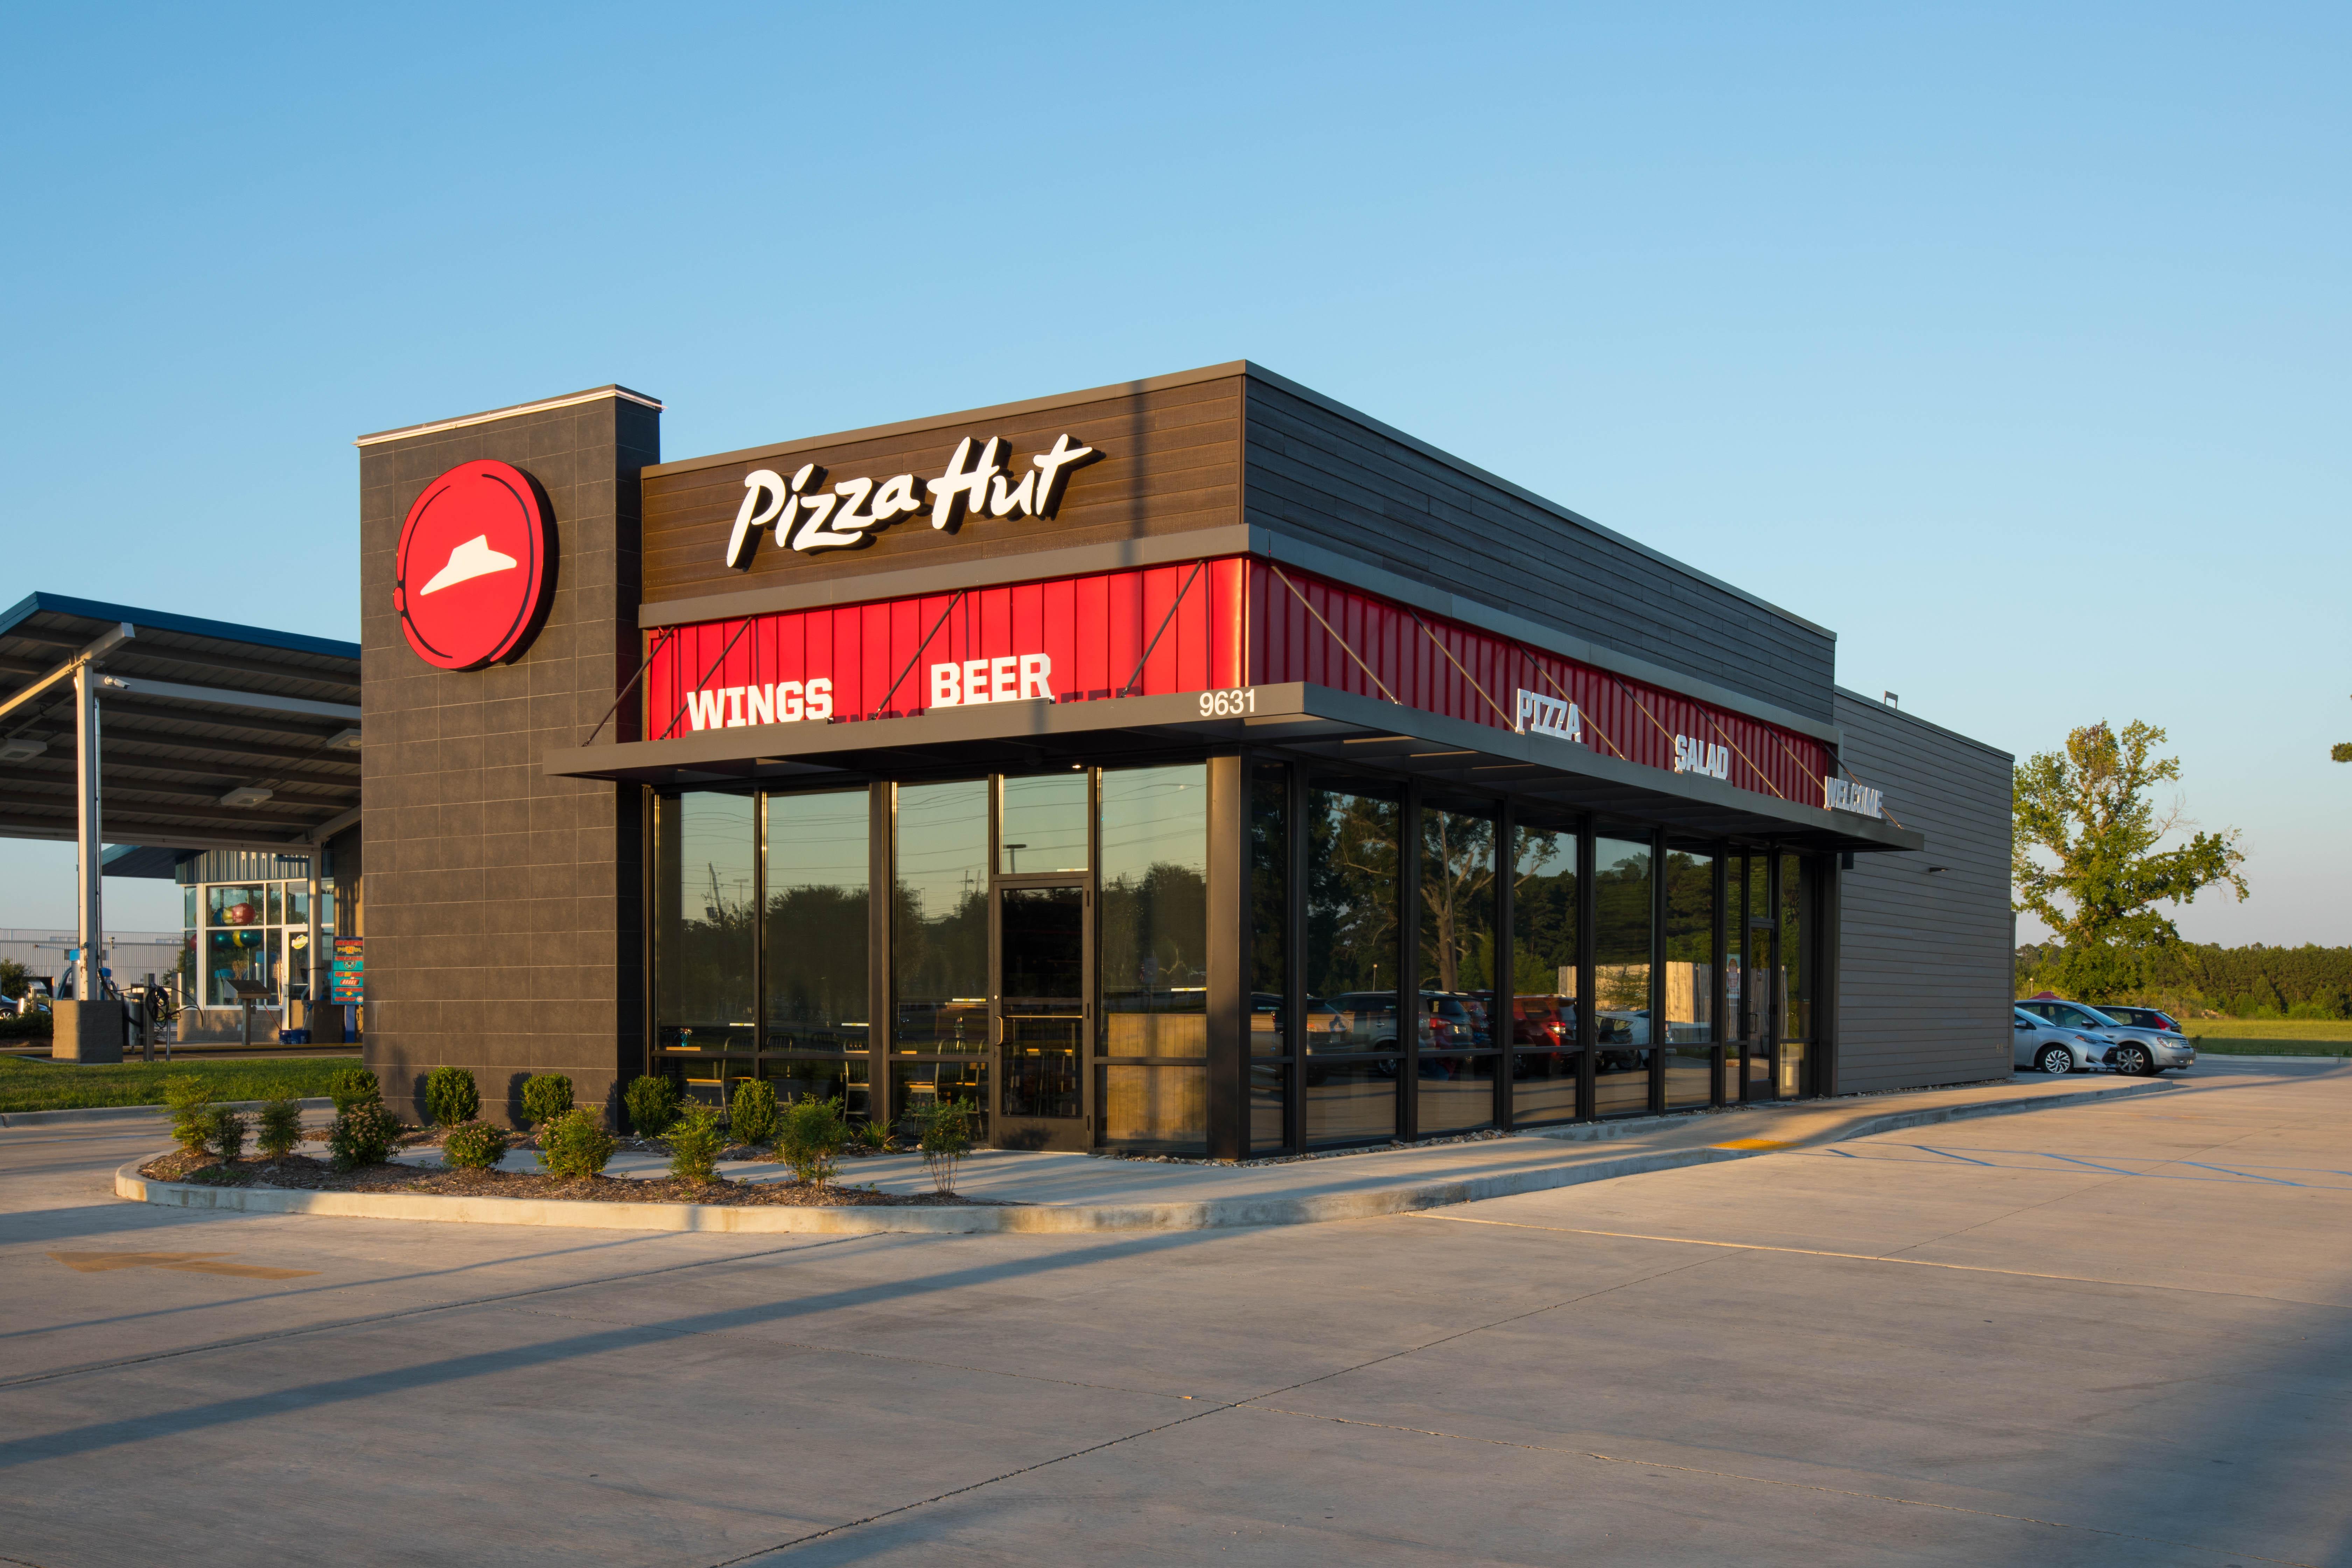 SHREVEPORT, LA - JUNE 29: Pizza Hut store in Shreveport, Louisiana on June 29, 2018. (Photo by Shannon O'Hara/Getty Images for Pizza Hut)